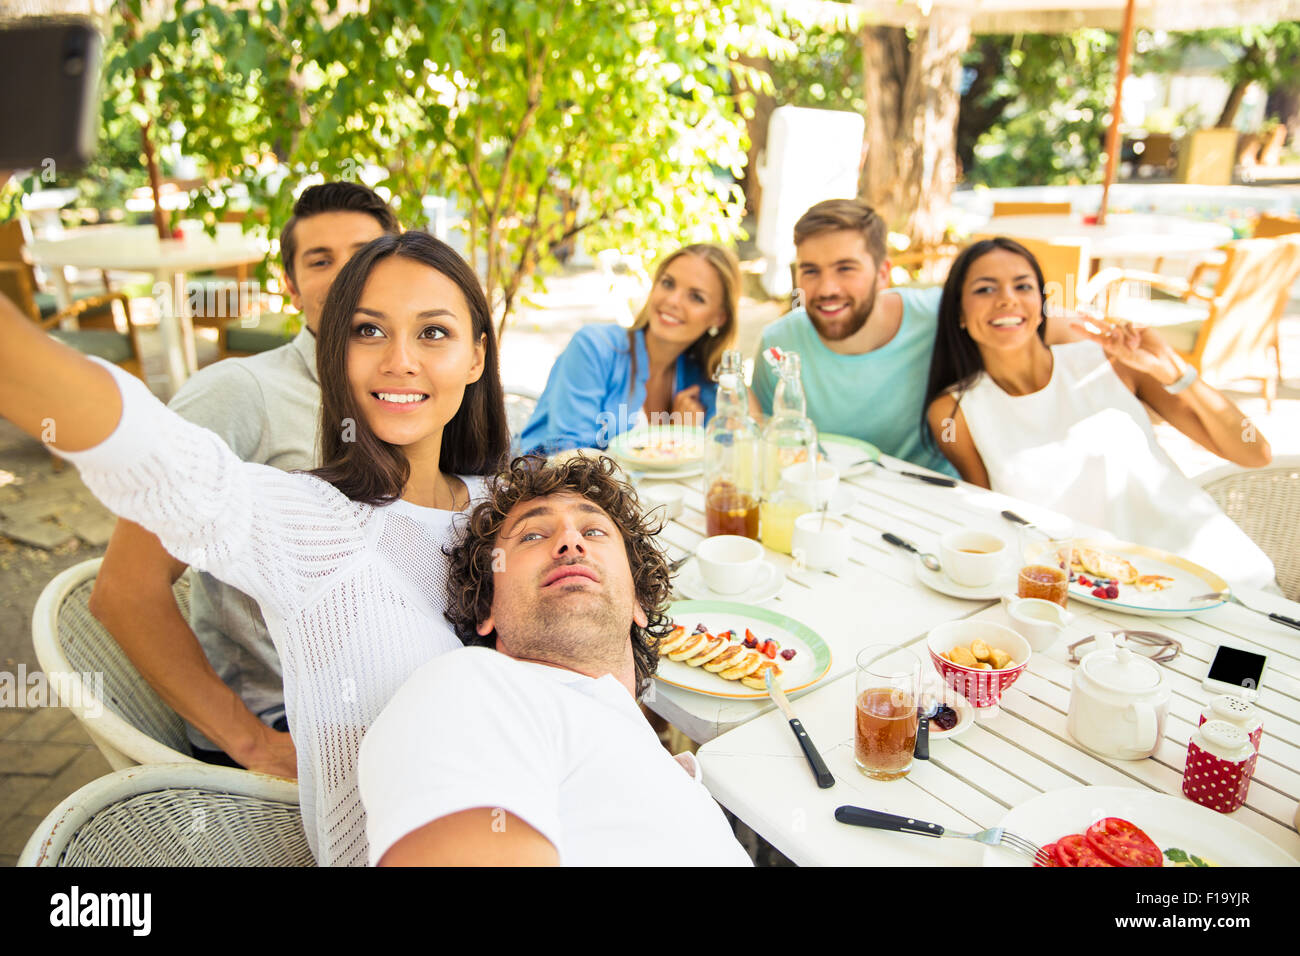 Portrait of a happy friends making selfie photo in outdoor restaurant - Stock Image